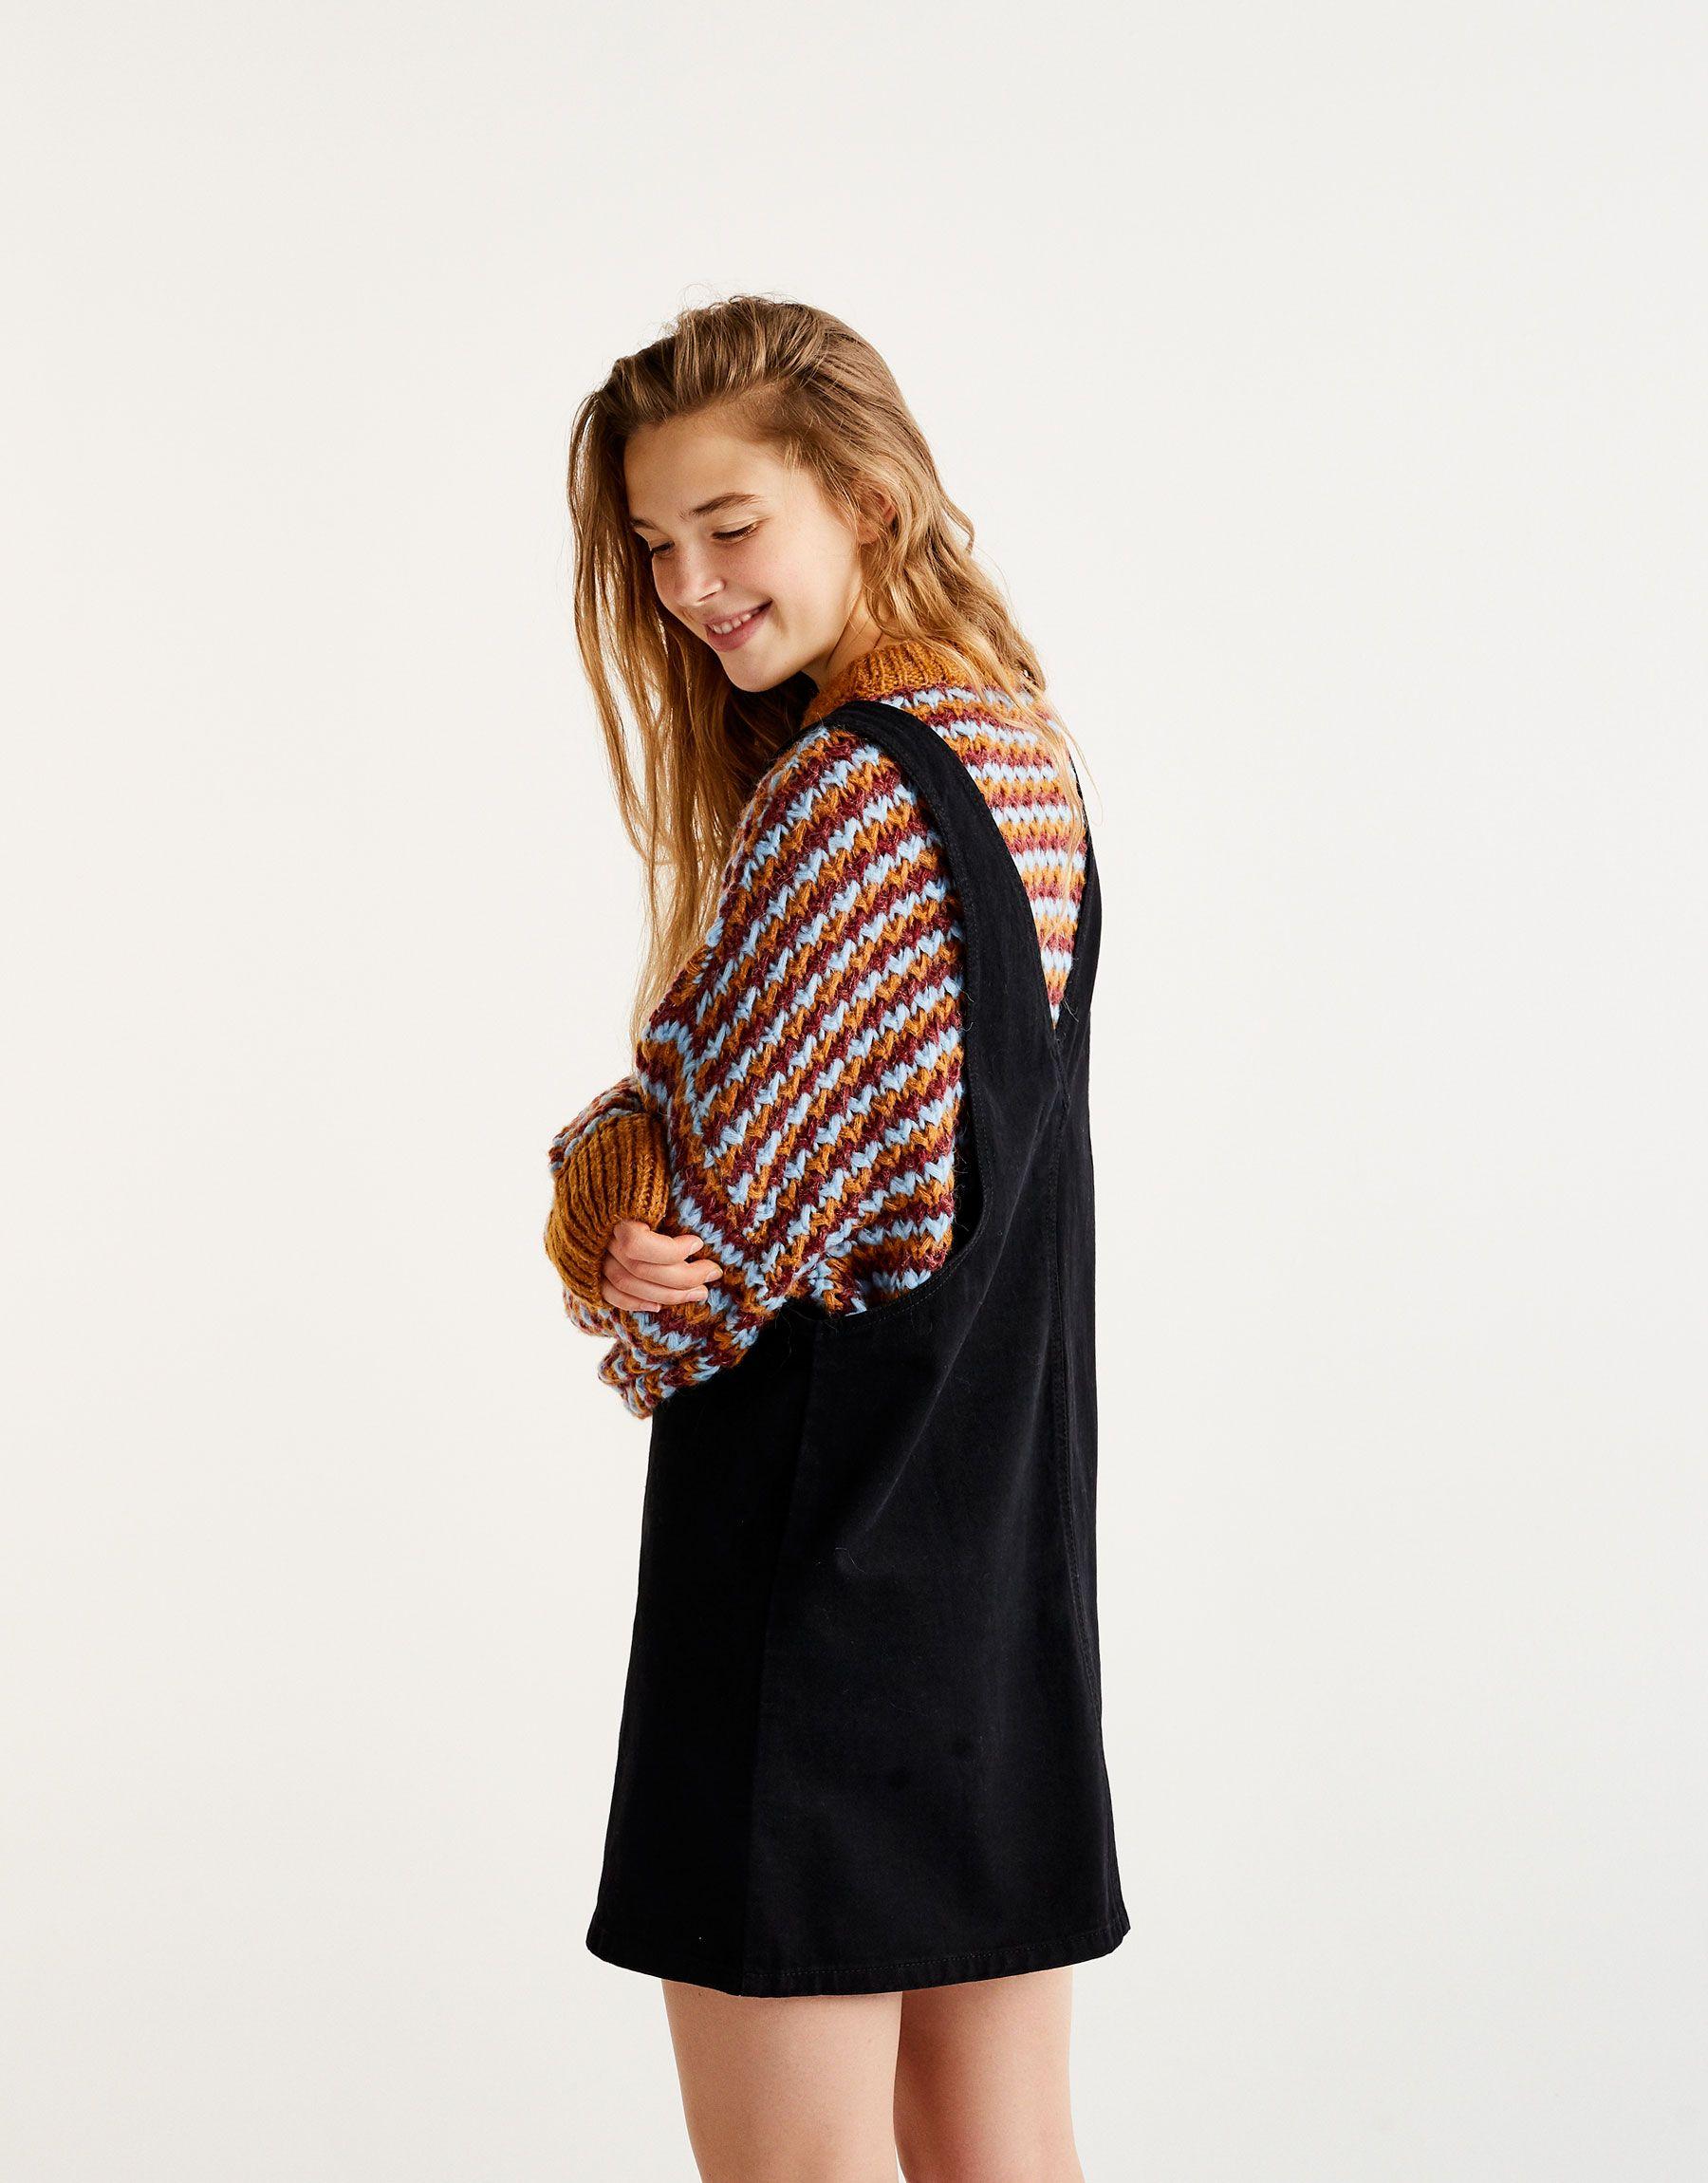 Robe salopette jean noire - Salopettes - Vêtements - Femme - PULL&BEAR  France